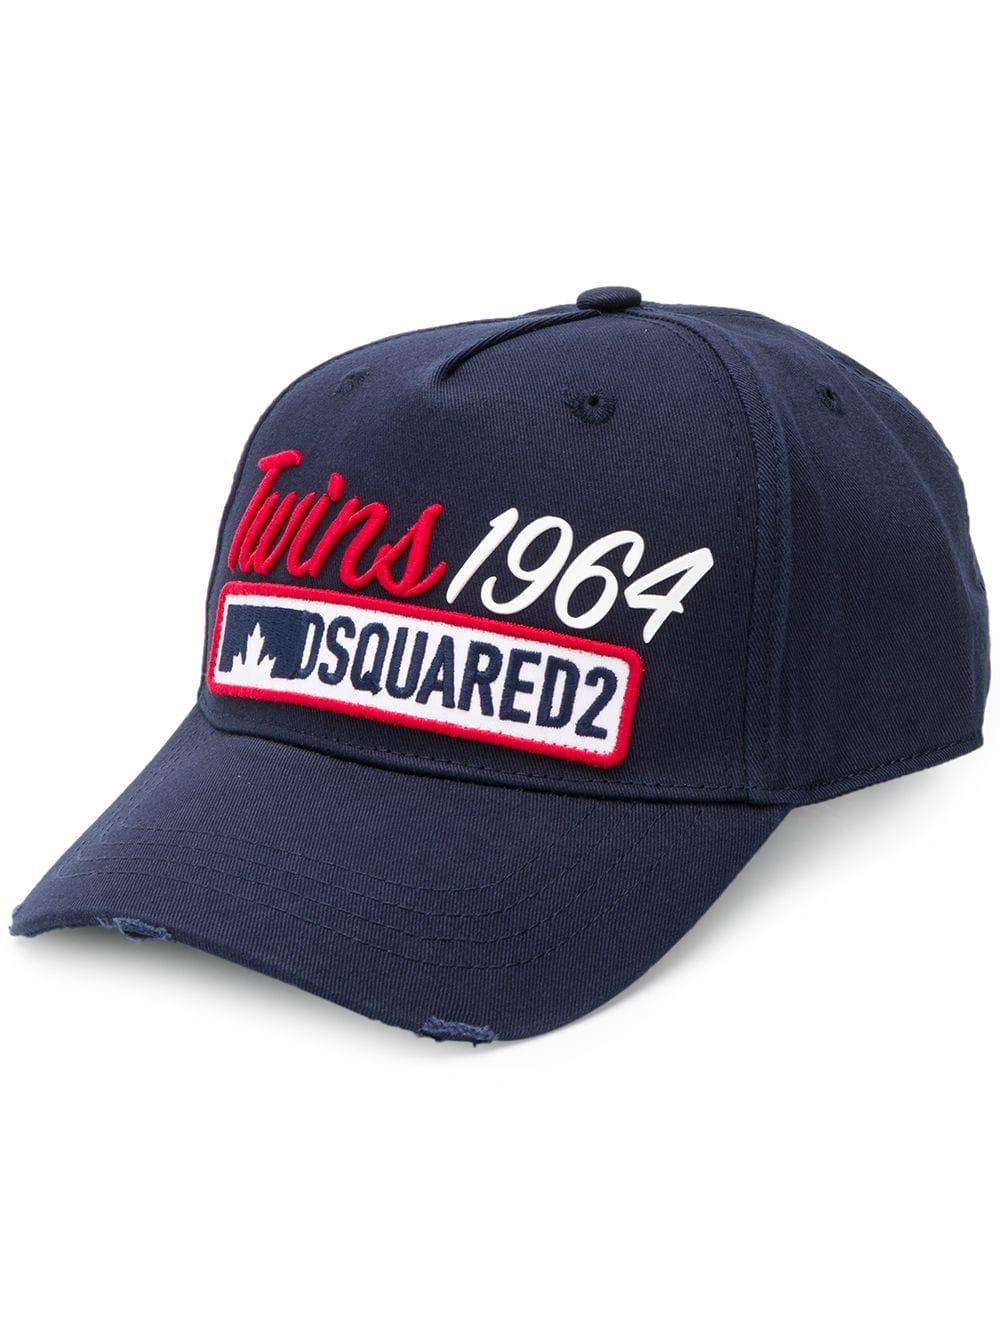 fa8fd086ea821 Twins 1964 Dsquared2 Baseball Cap - DSQUARED2 - Russocapri